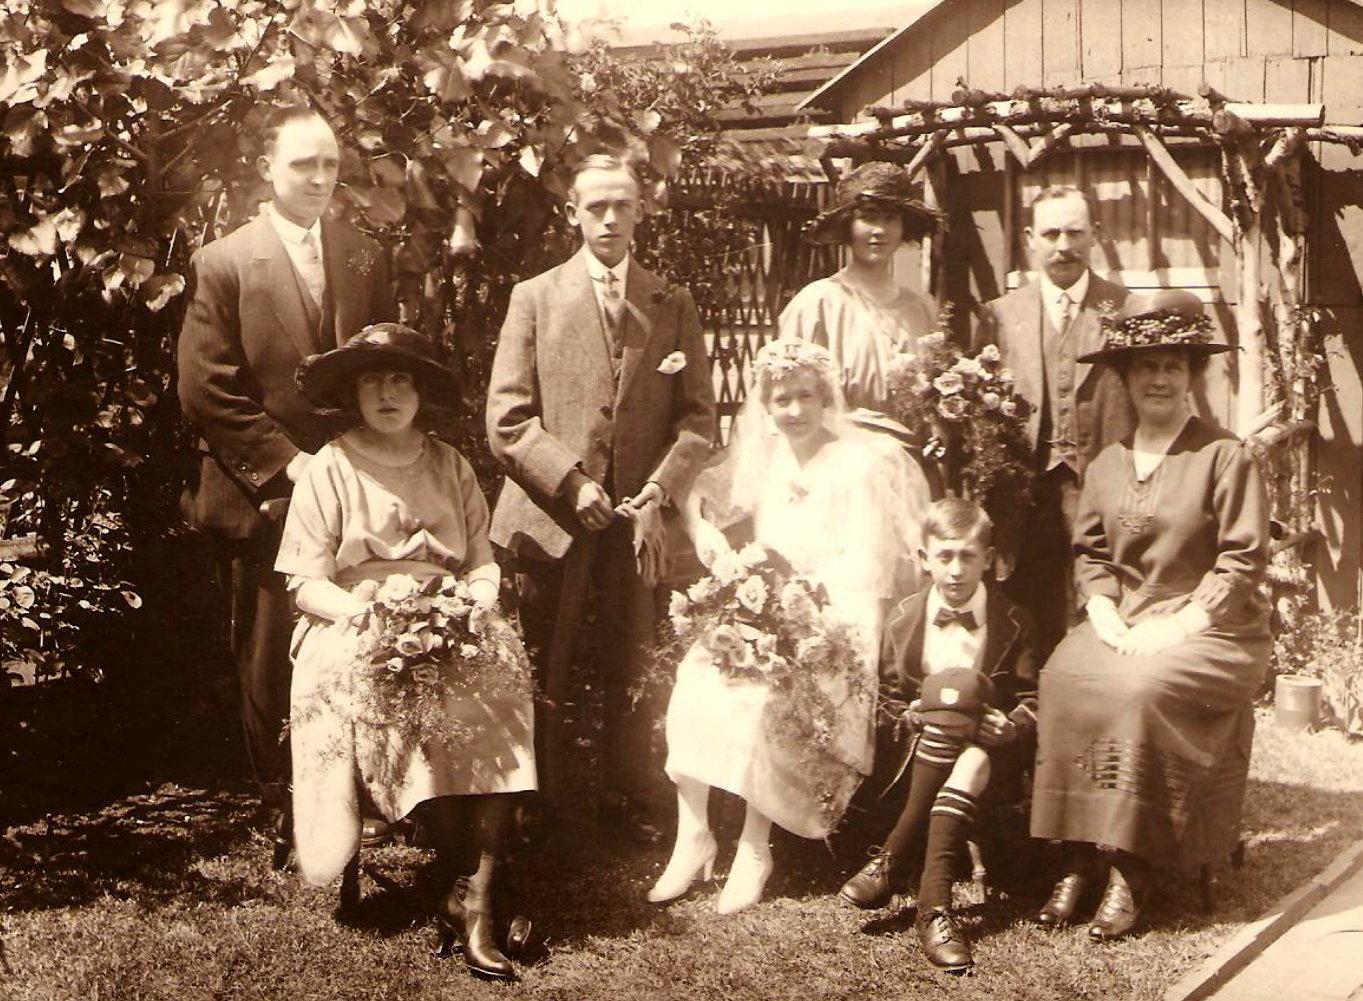 The wedding of James and Hilda Platt